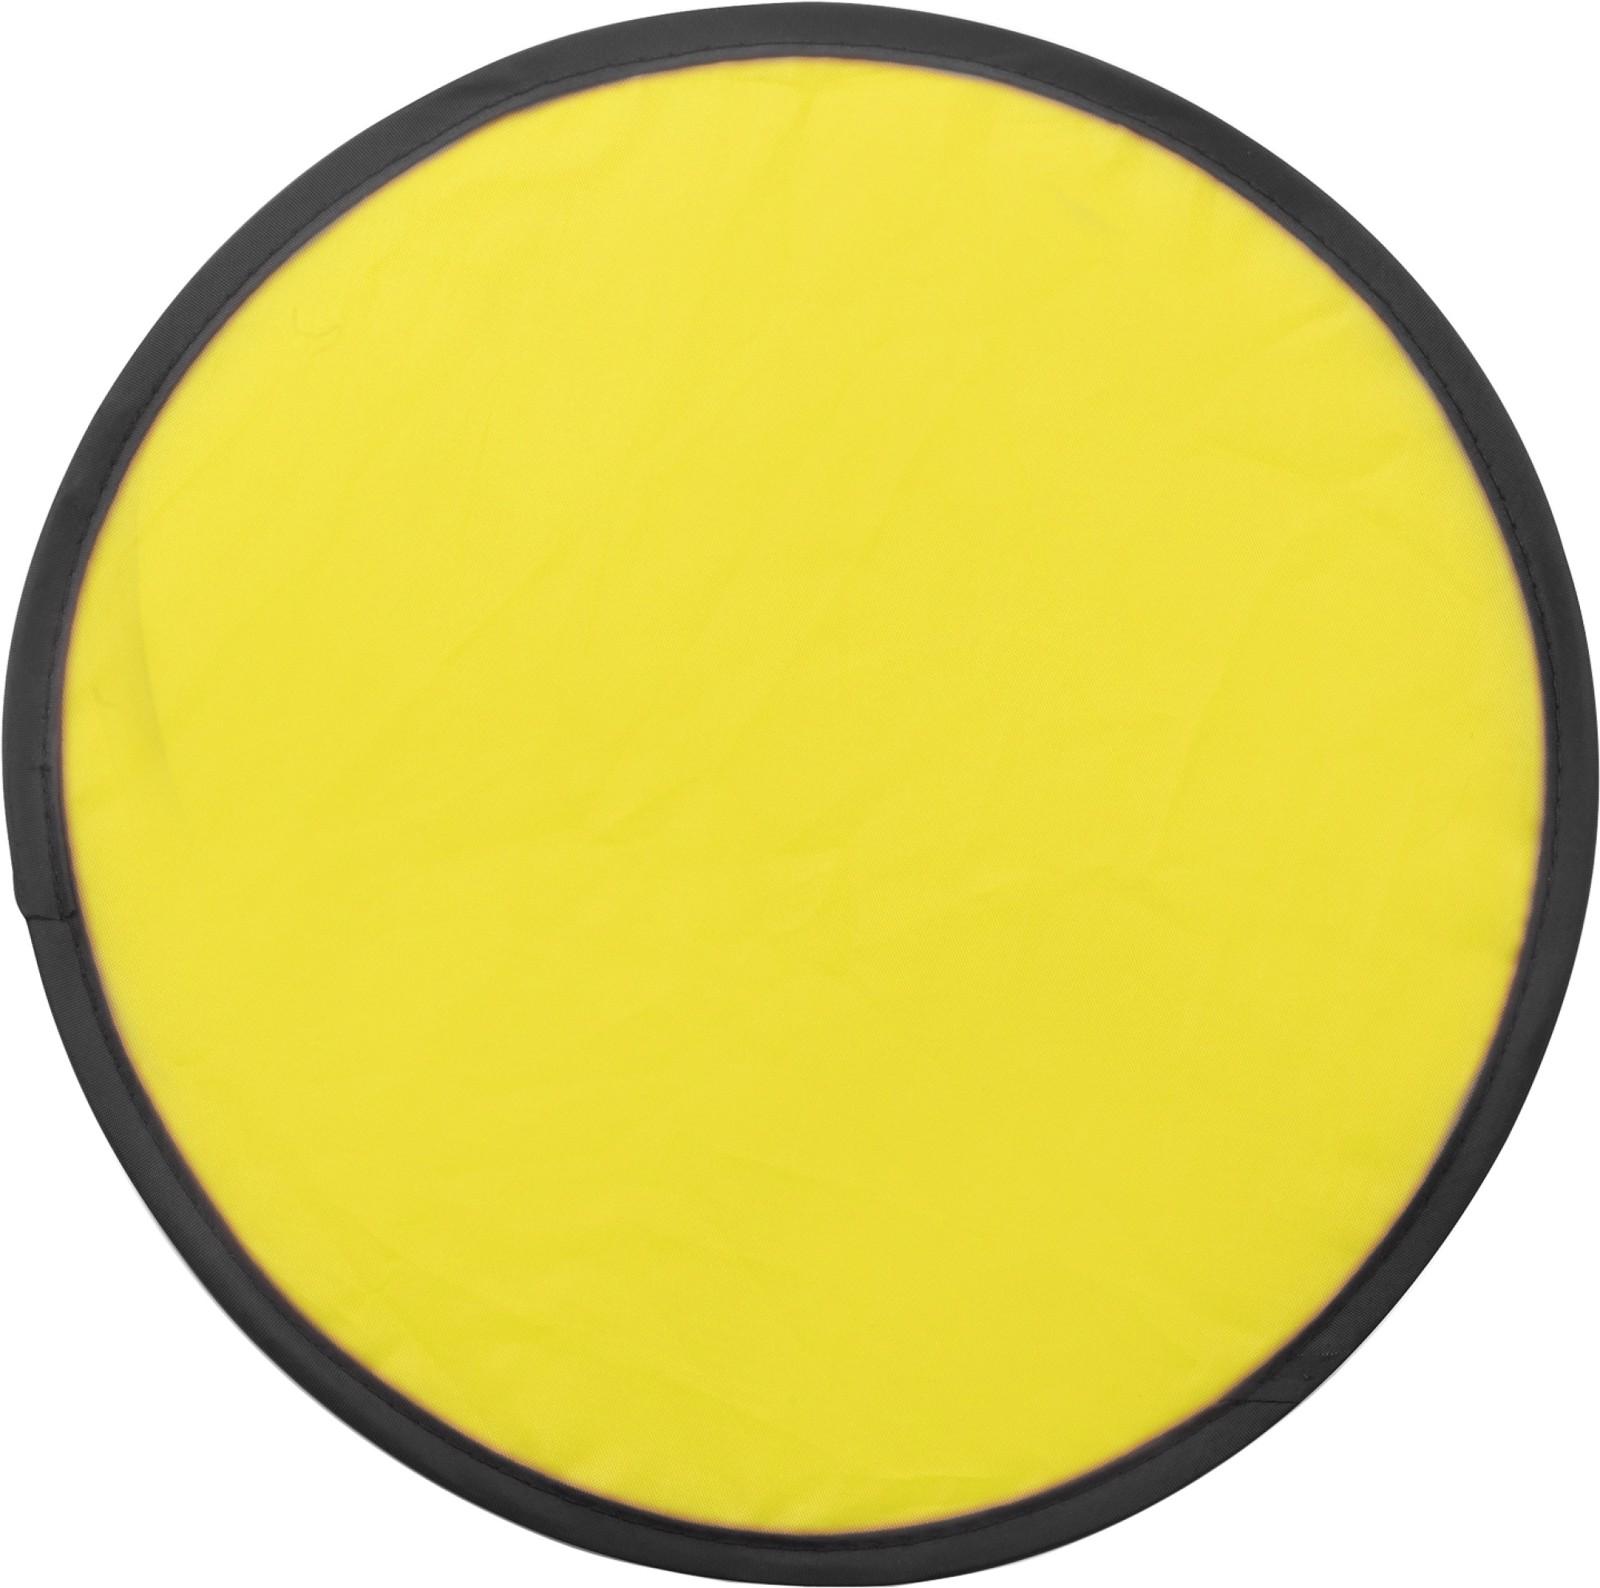 Nylon (170T) Frisbee - Yellow